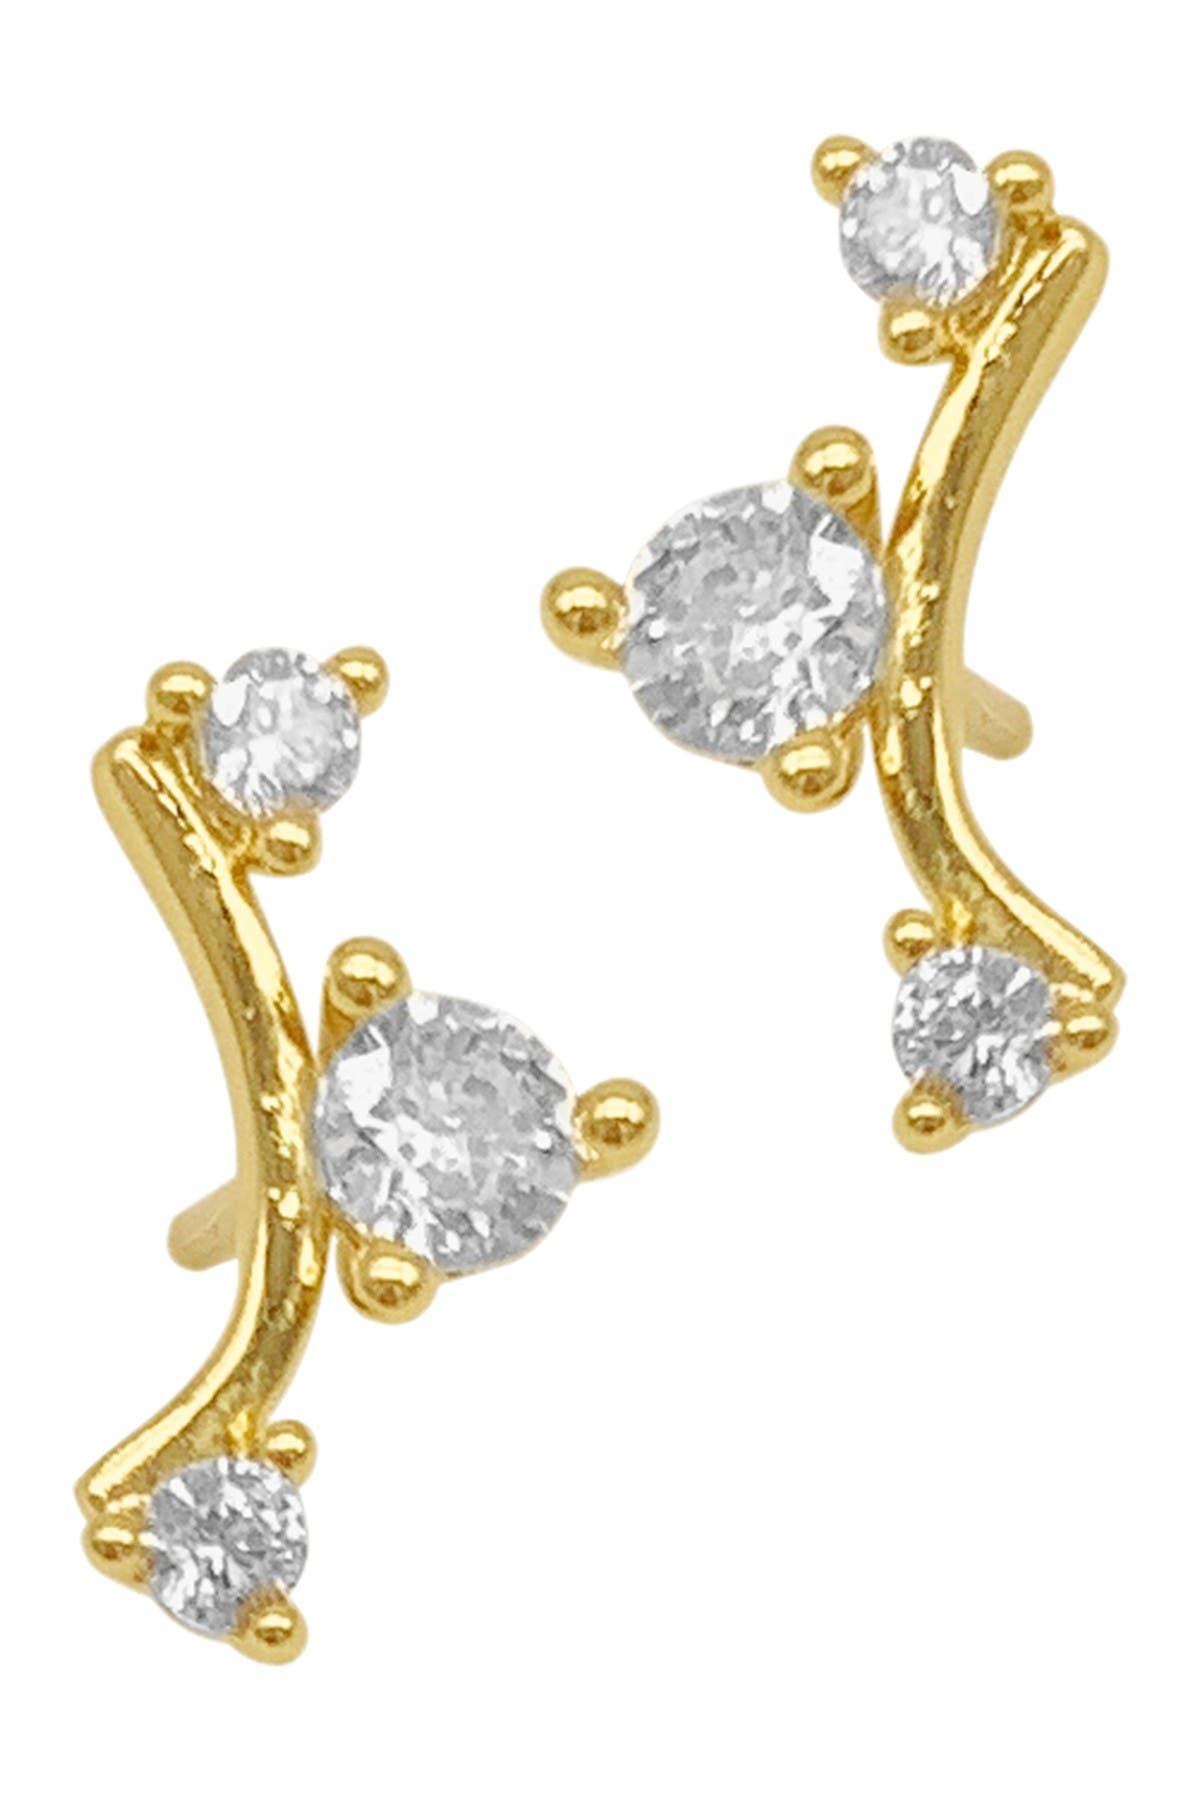 Adornia 14k Gold Plated Triple Rhinestone Climber Stud Earrings In Yellow